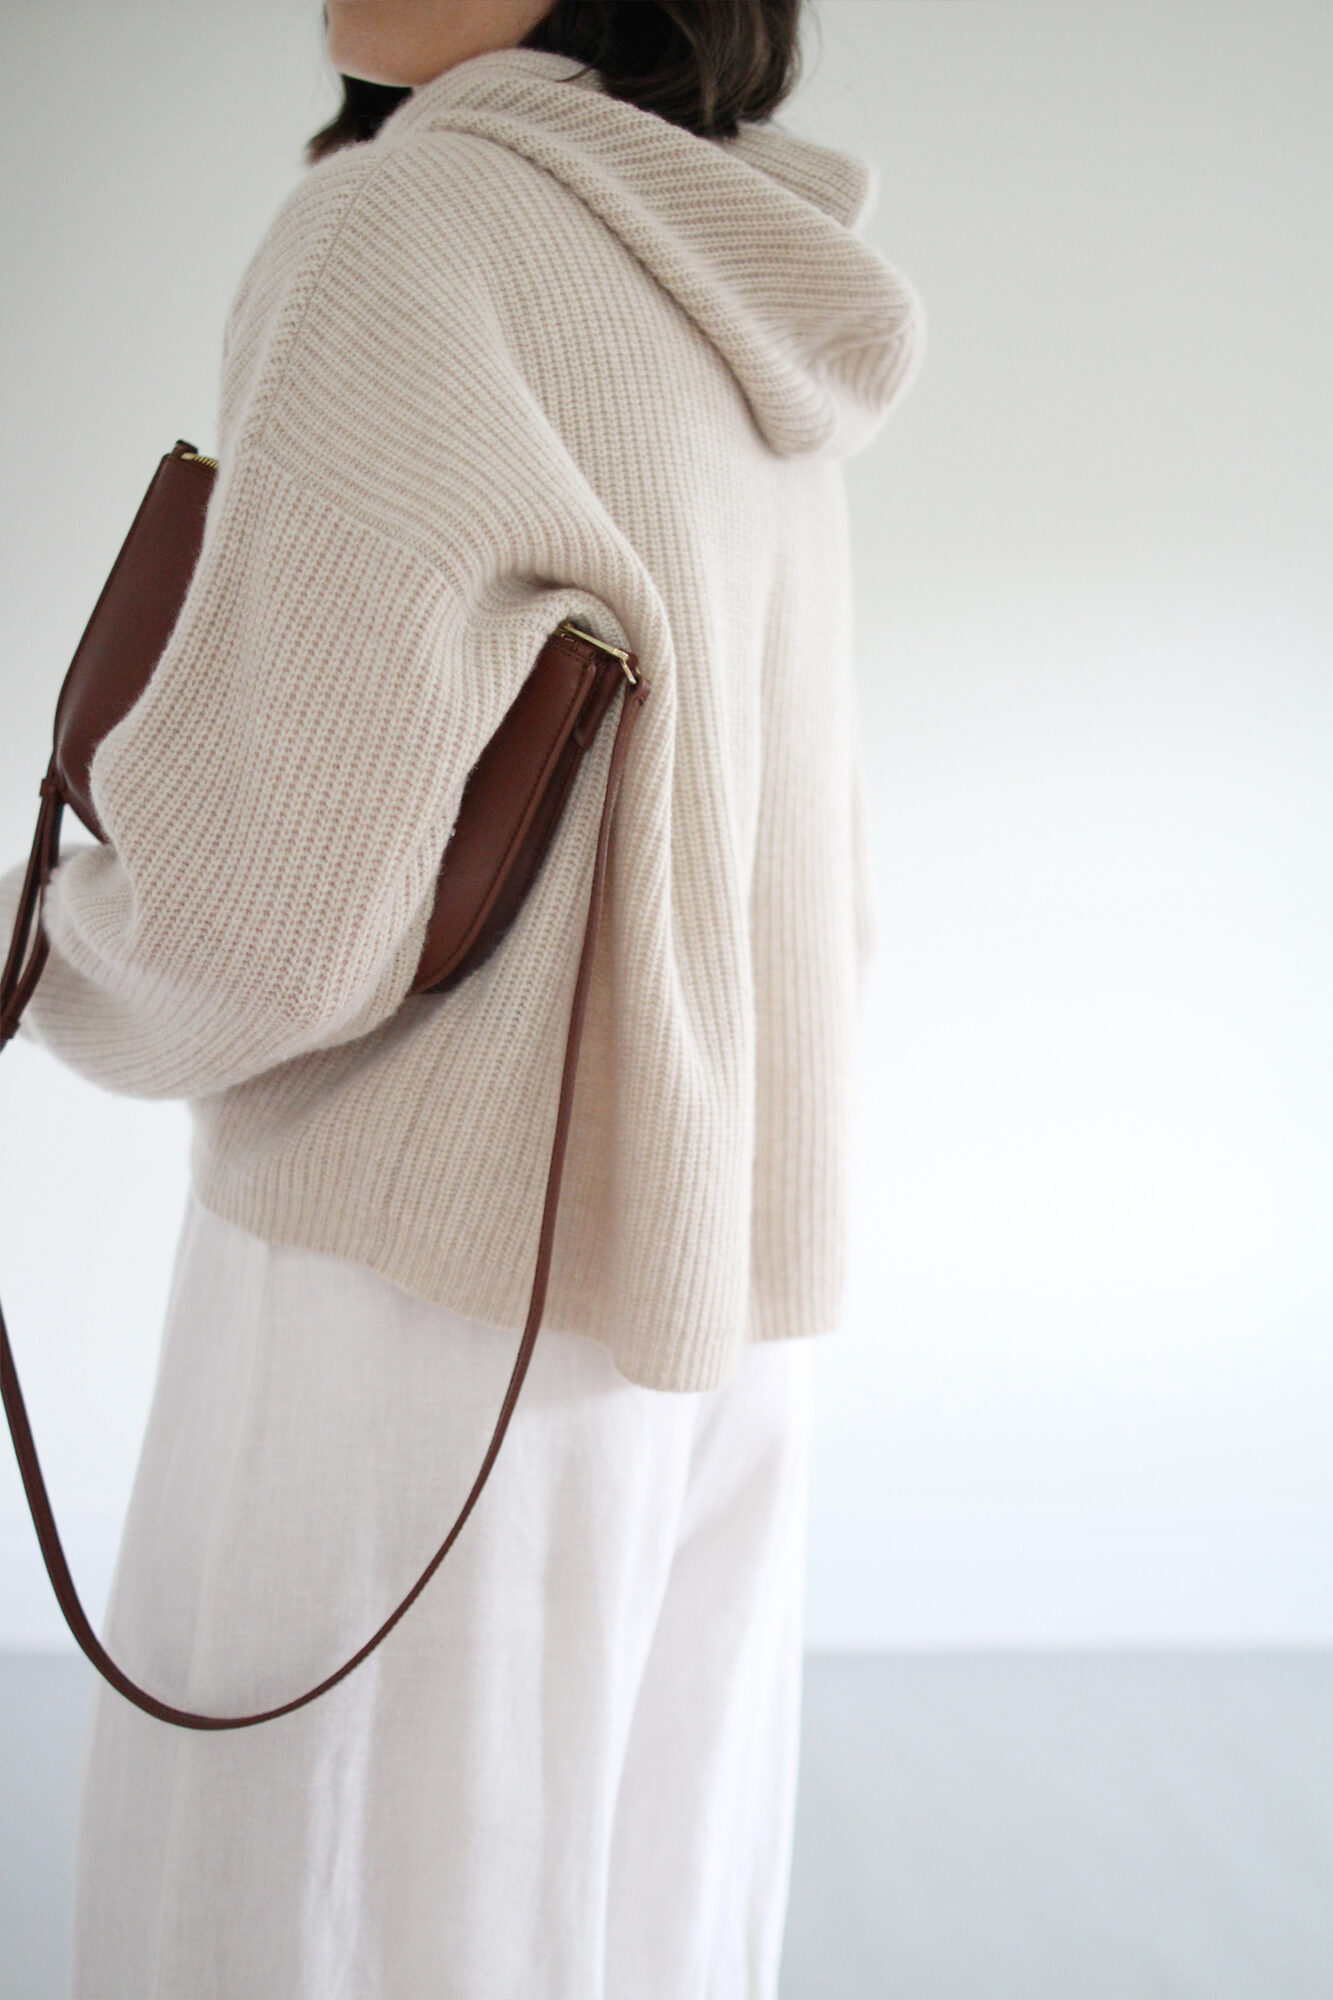 Style Bee - Light Knits & Linen